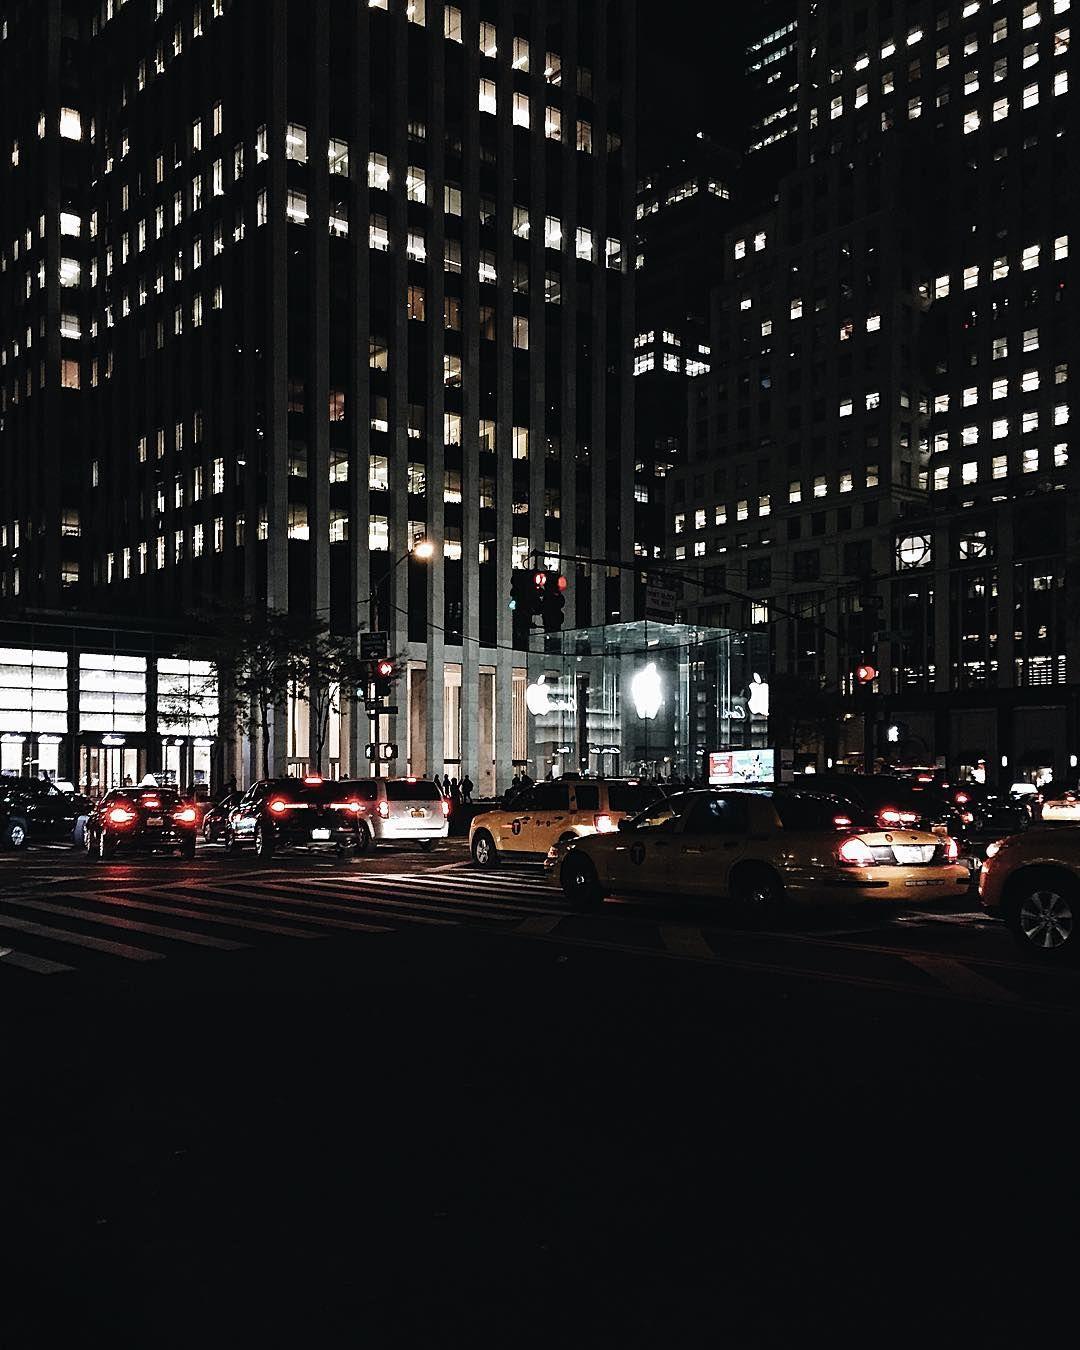 «Apple fans should be here  #applestore #applefan #D4NHxNYC #newyork #newyorkcity #nyc #fifthavenue #vsco #vscocam»